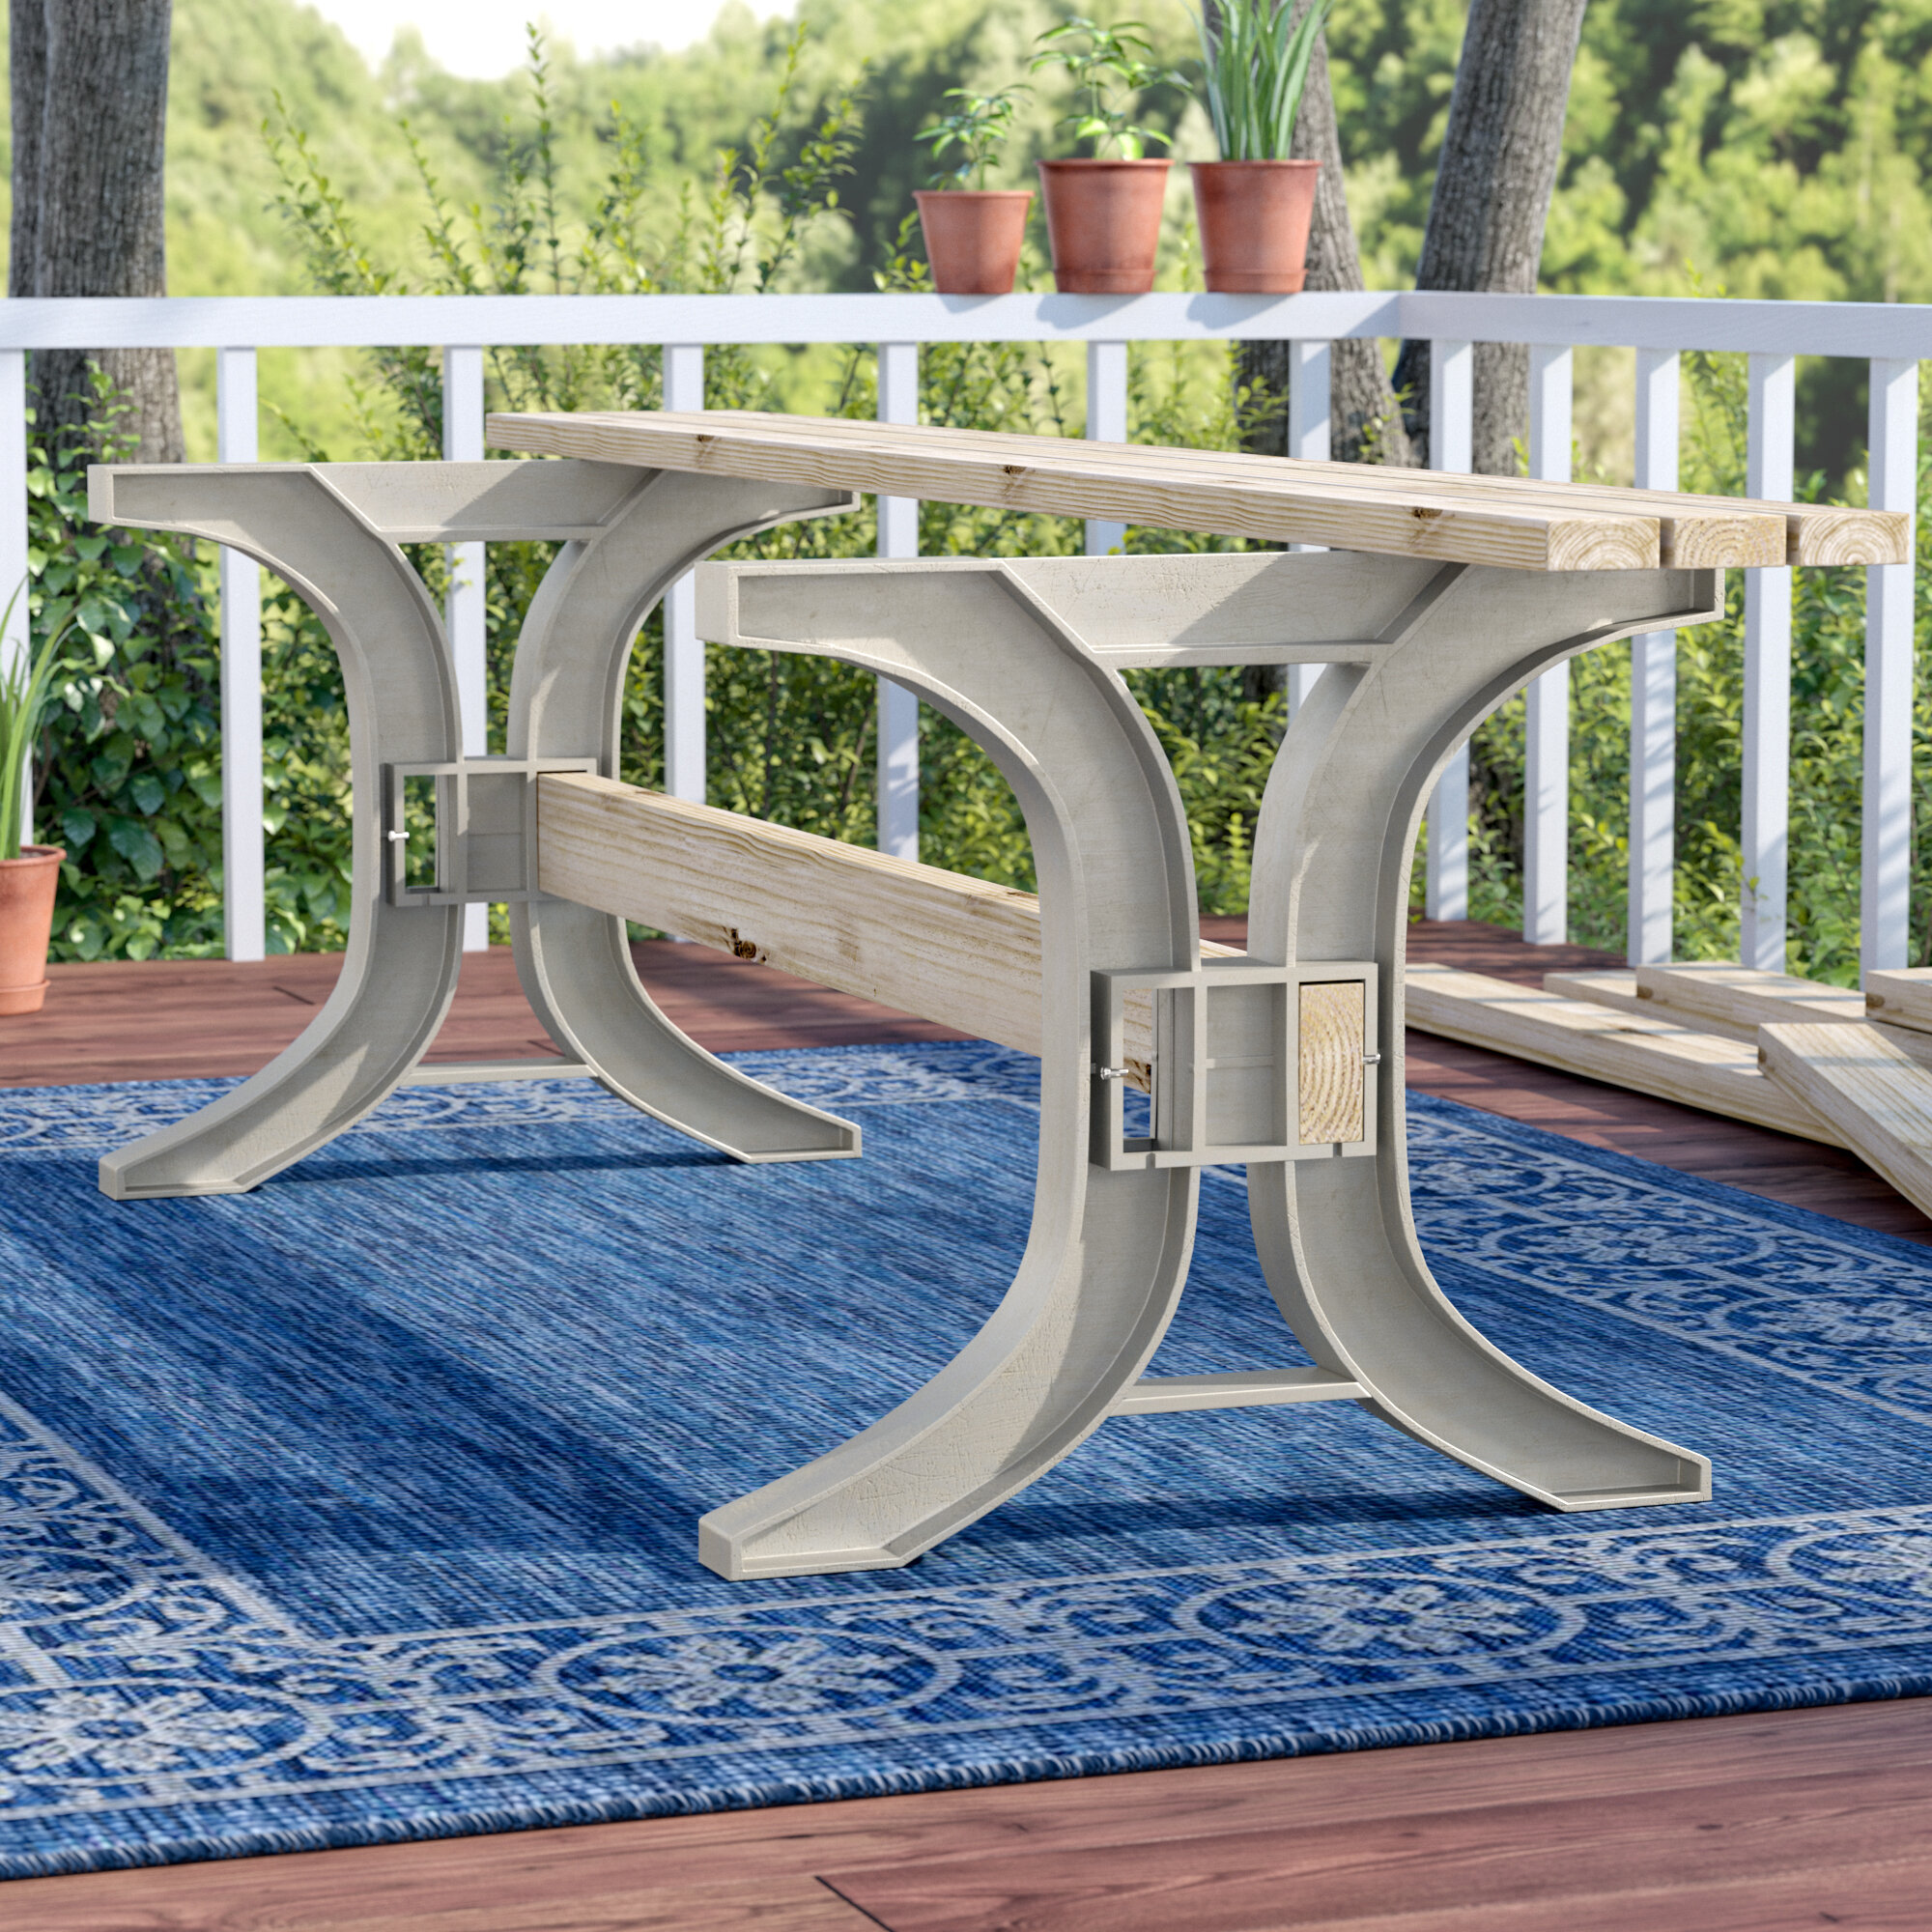 Charlton home westview patio dining table legs reviews wayfair